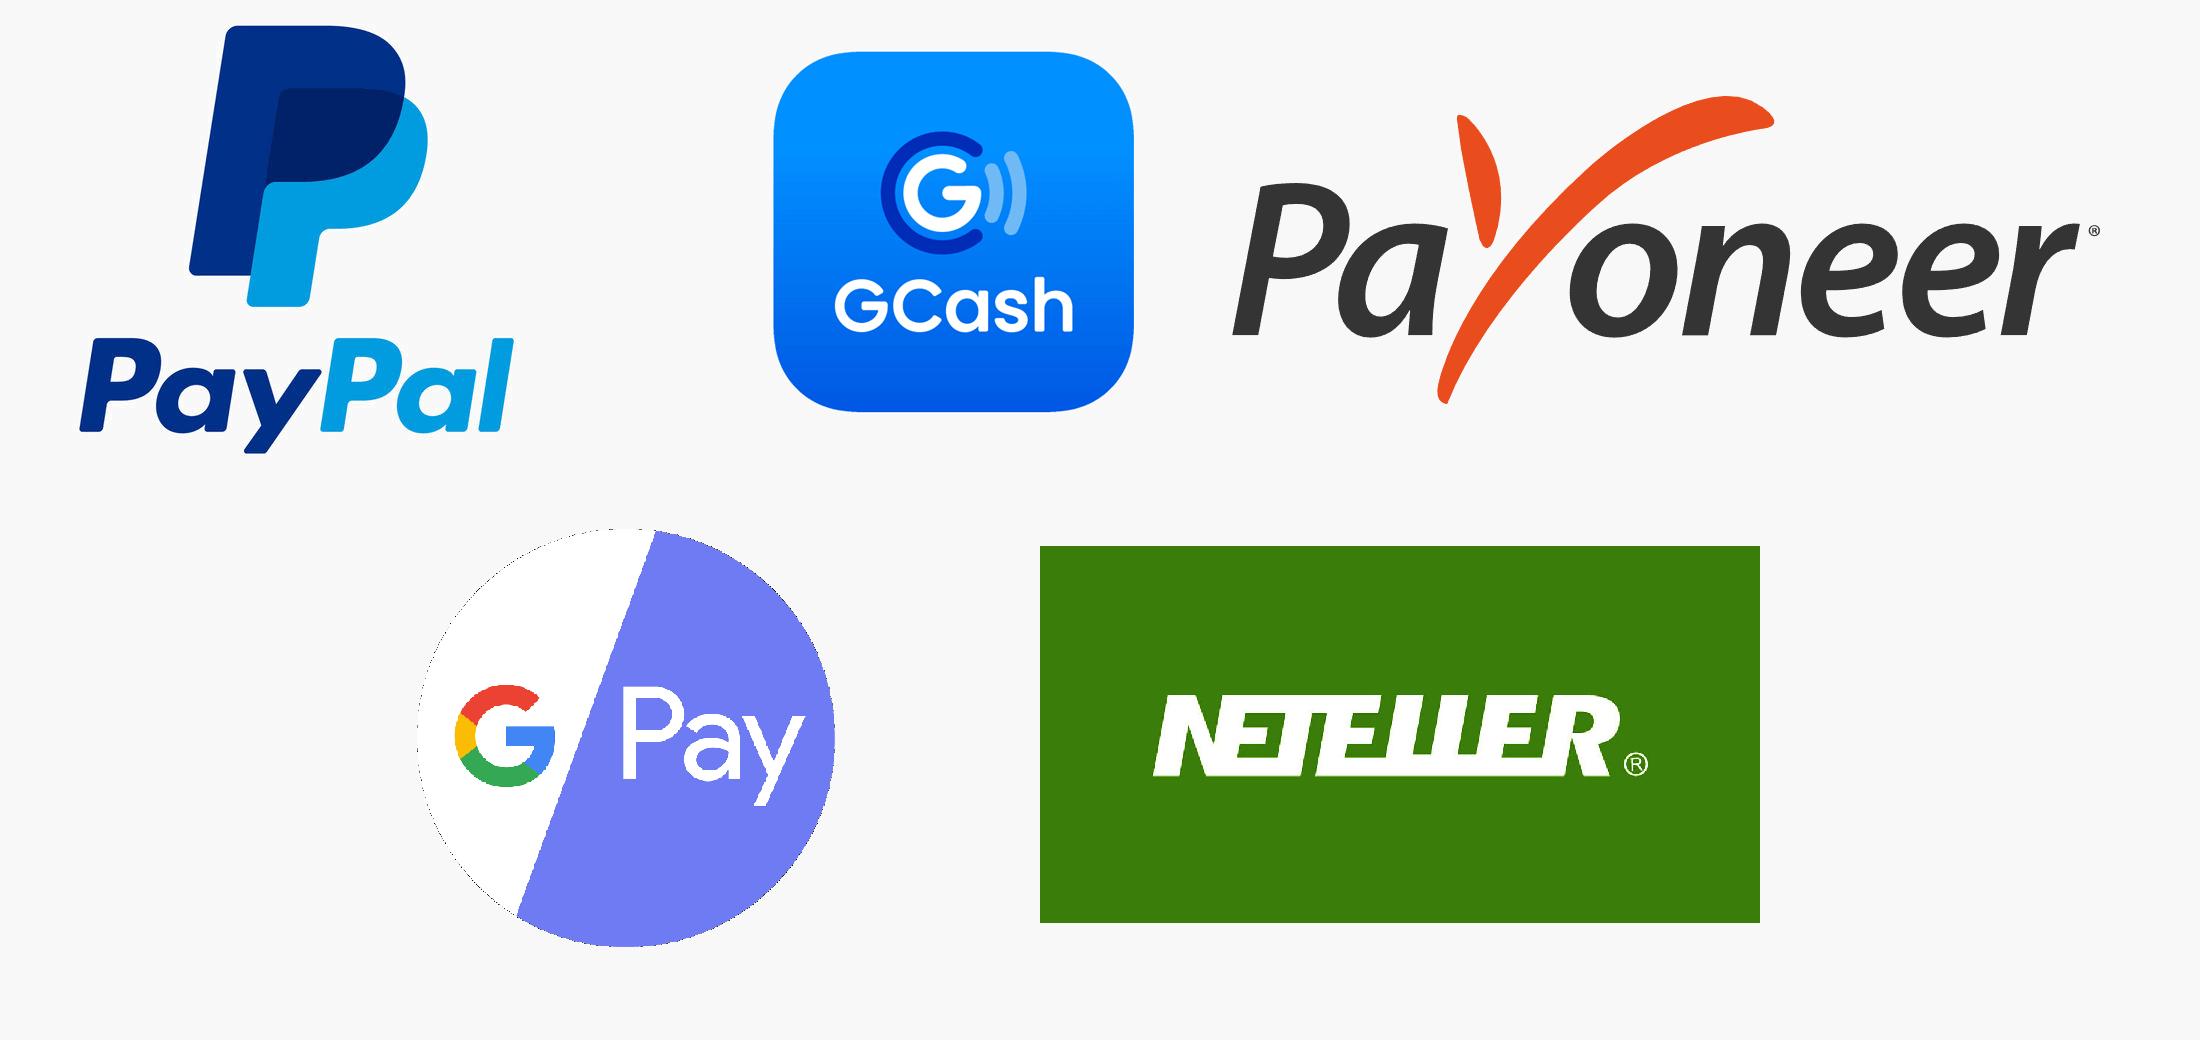 Skrill app review other digital wallet apps